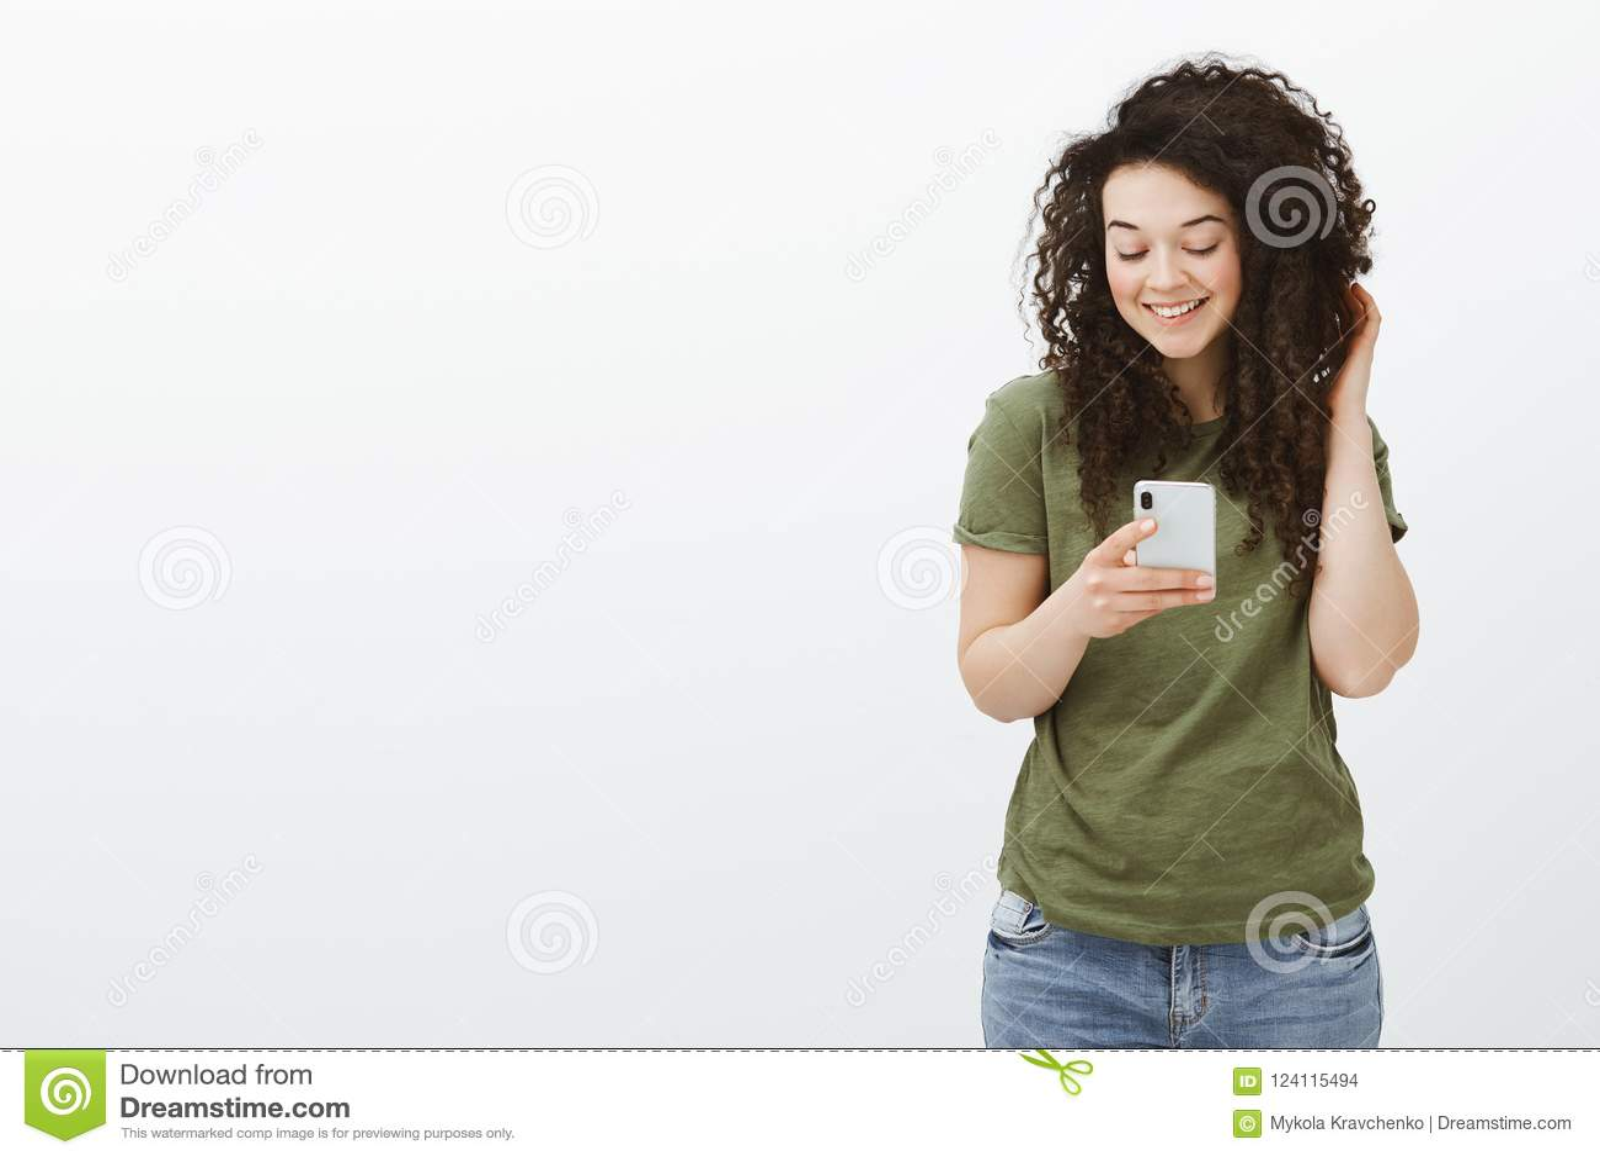 Flirty Beautiful Curly-haired Girl In Dark-green T-shirt, Touching